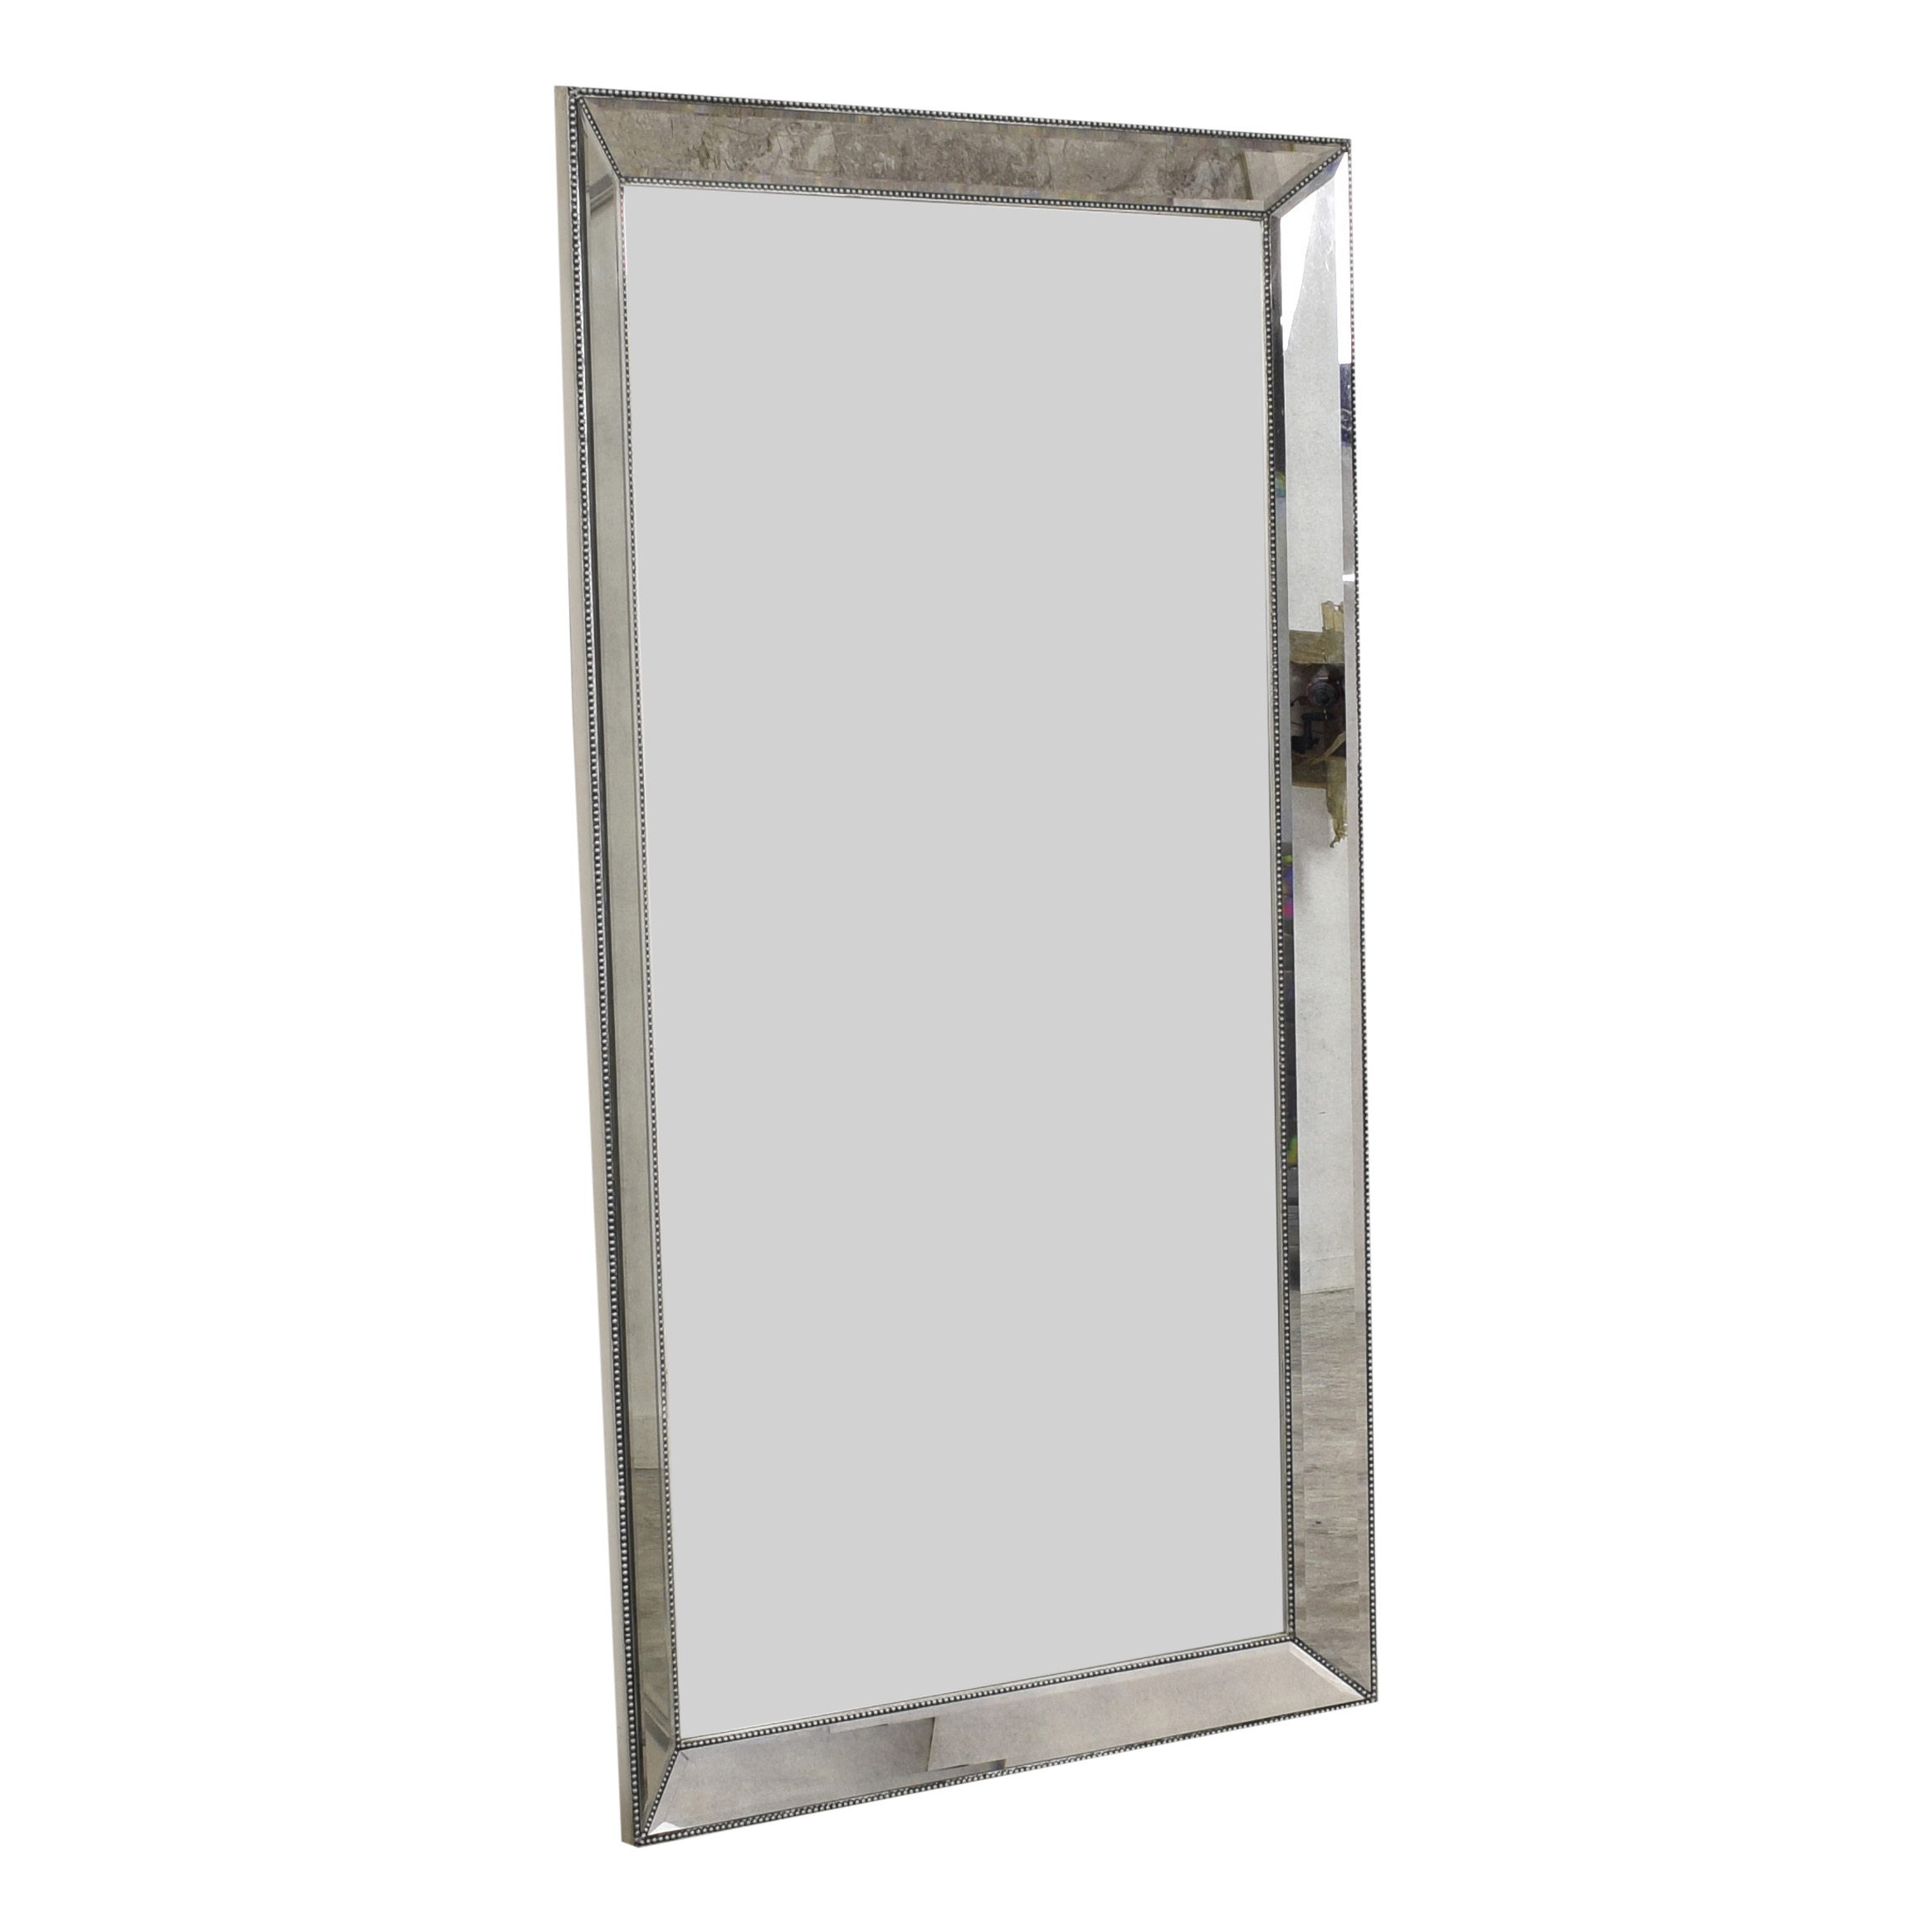 Macy's Marais Mirrored Floor Mirror / Decor